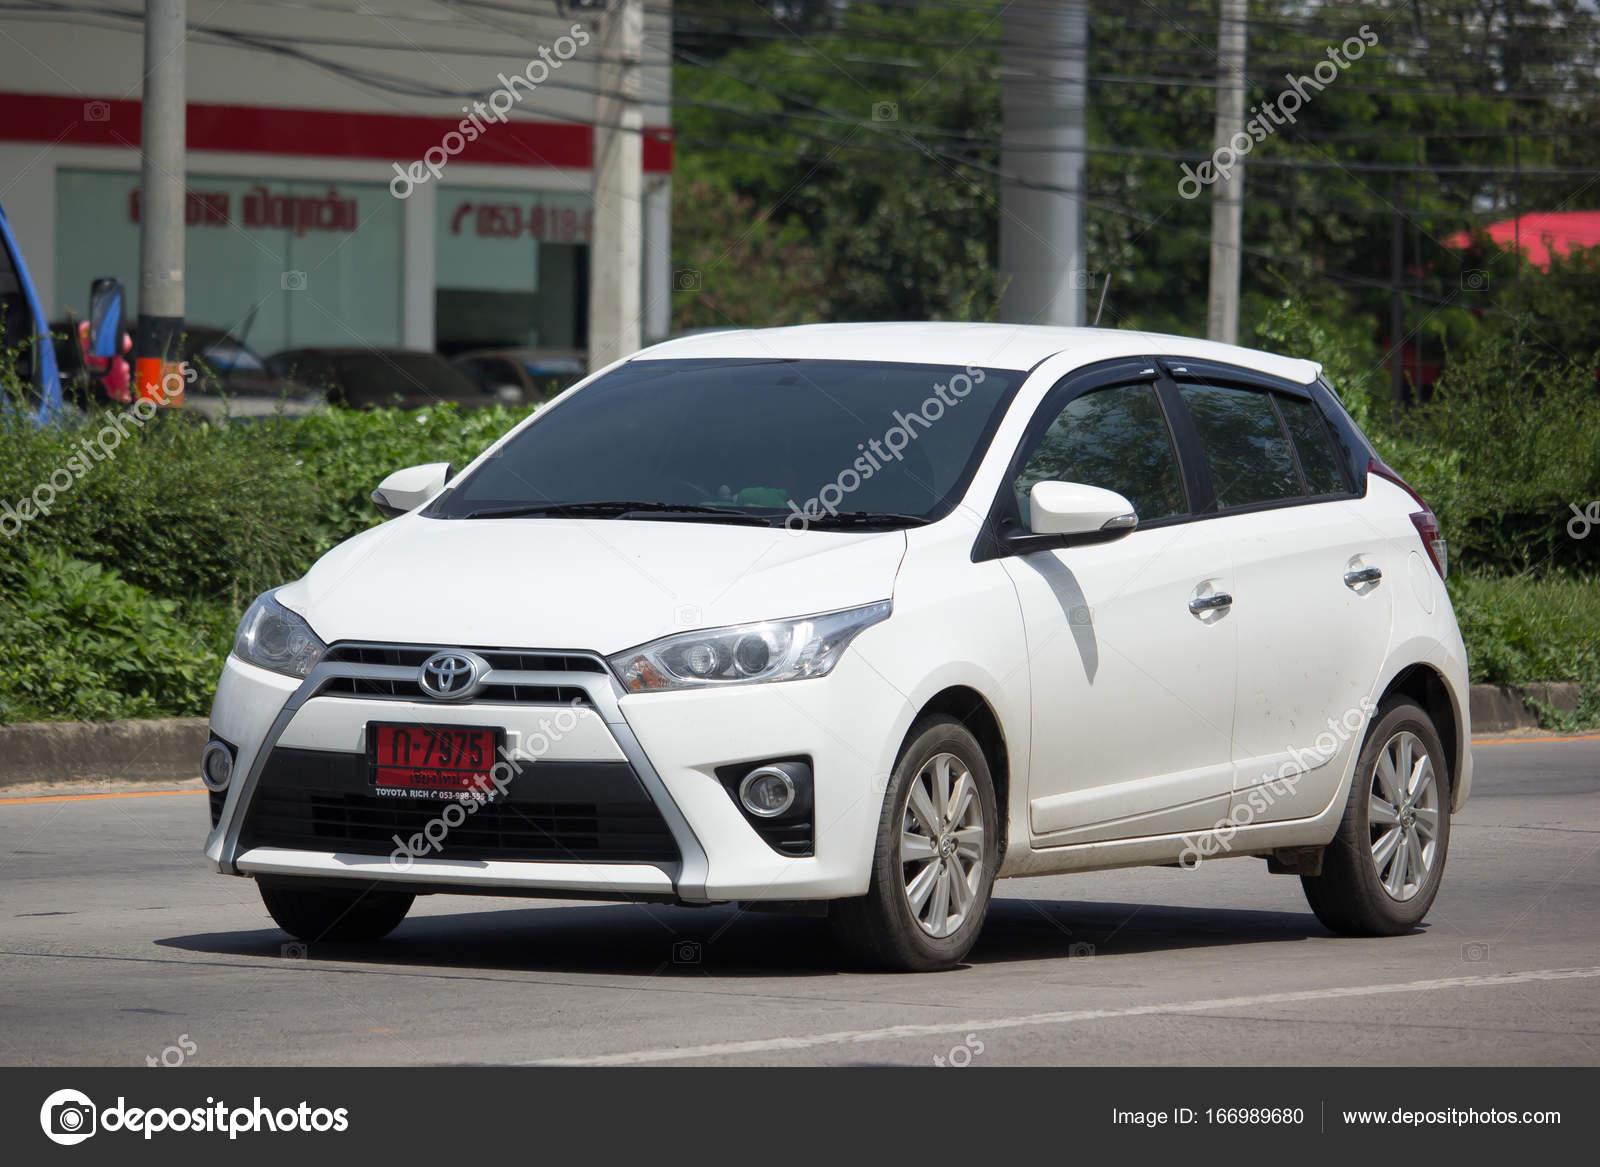 Private Car Toyota Yaris Eco Car Stock Editorial Photo C Nitinut380 166989680